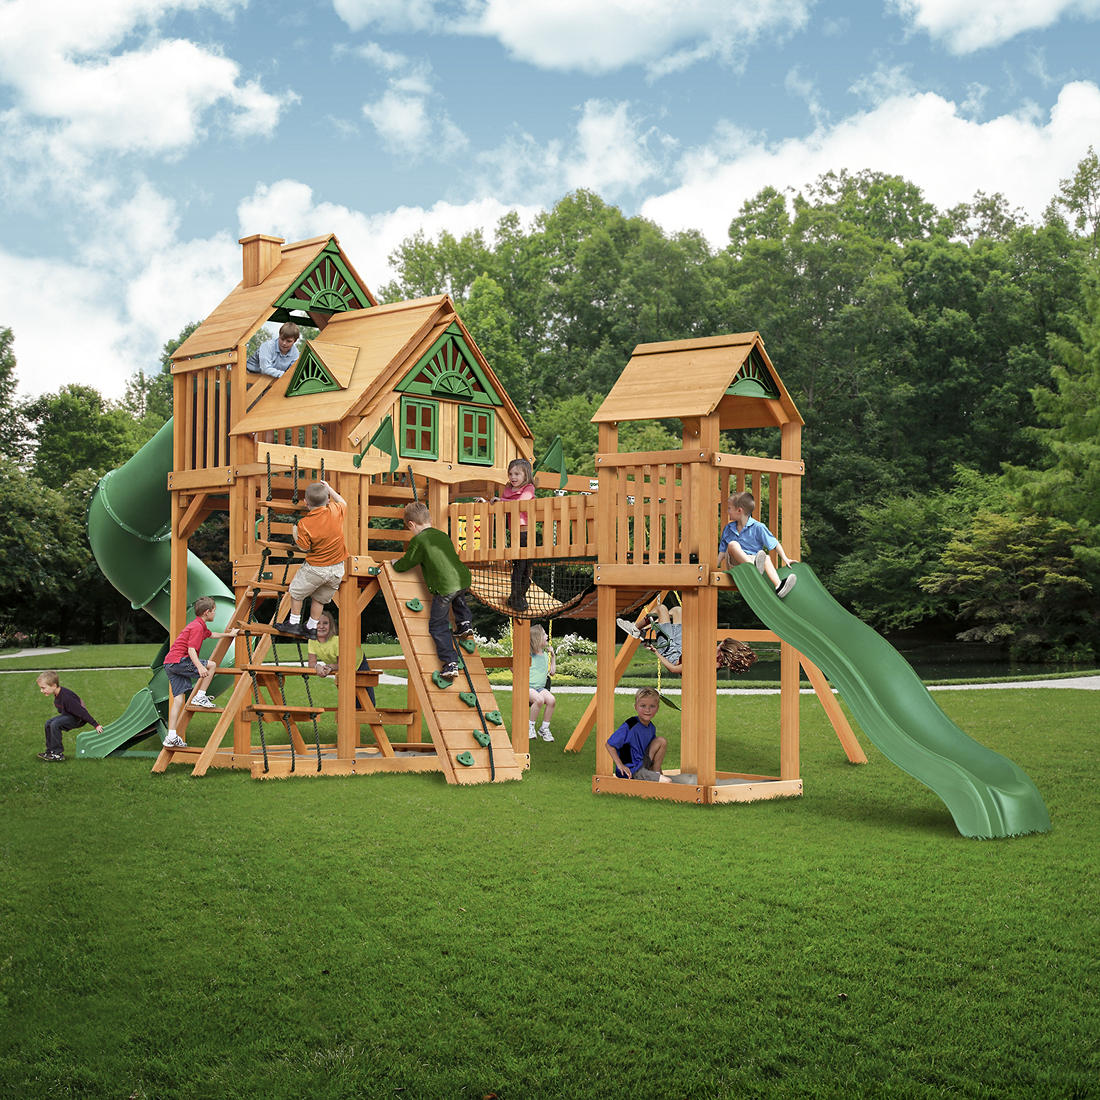 Strange Gorilla Playsets Parkview Wooden Cedar Treehouse Swing Set Download Free Architecture Designs Scobabritishbridgeorg